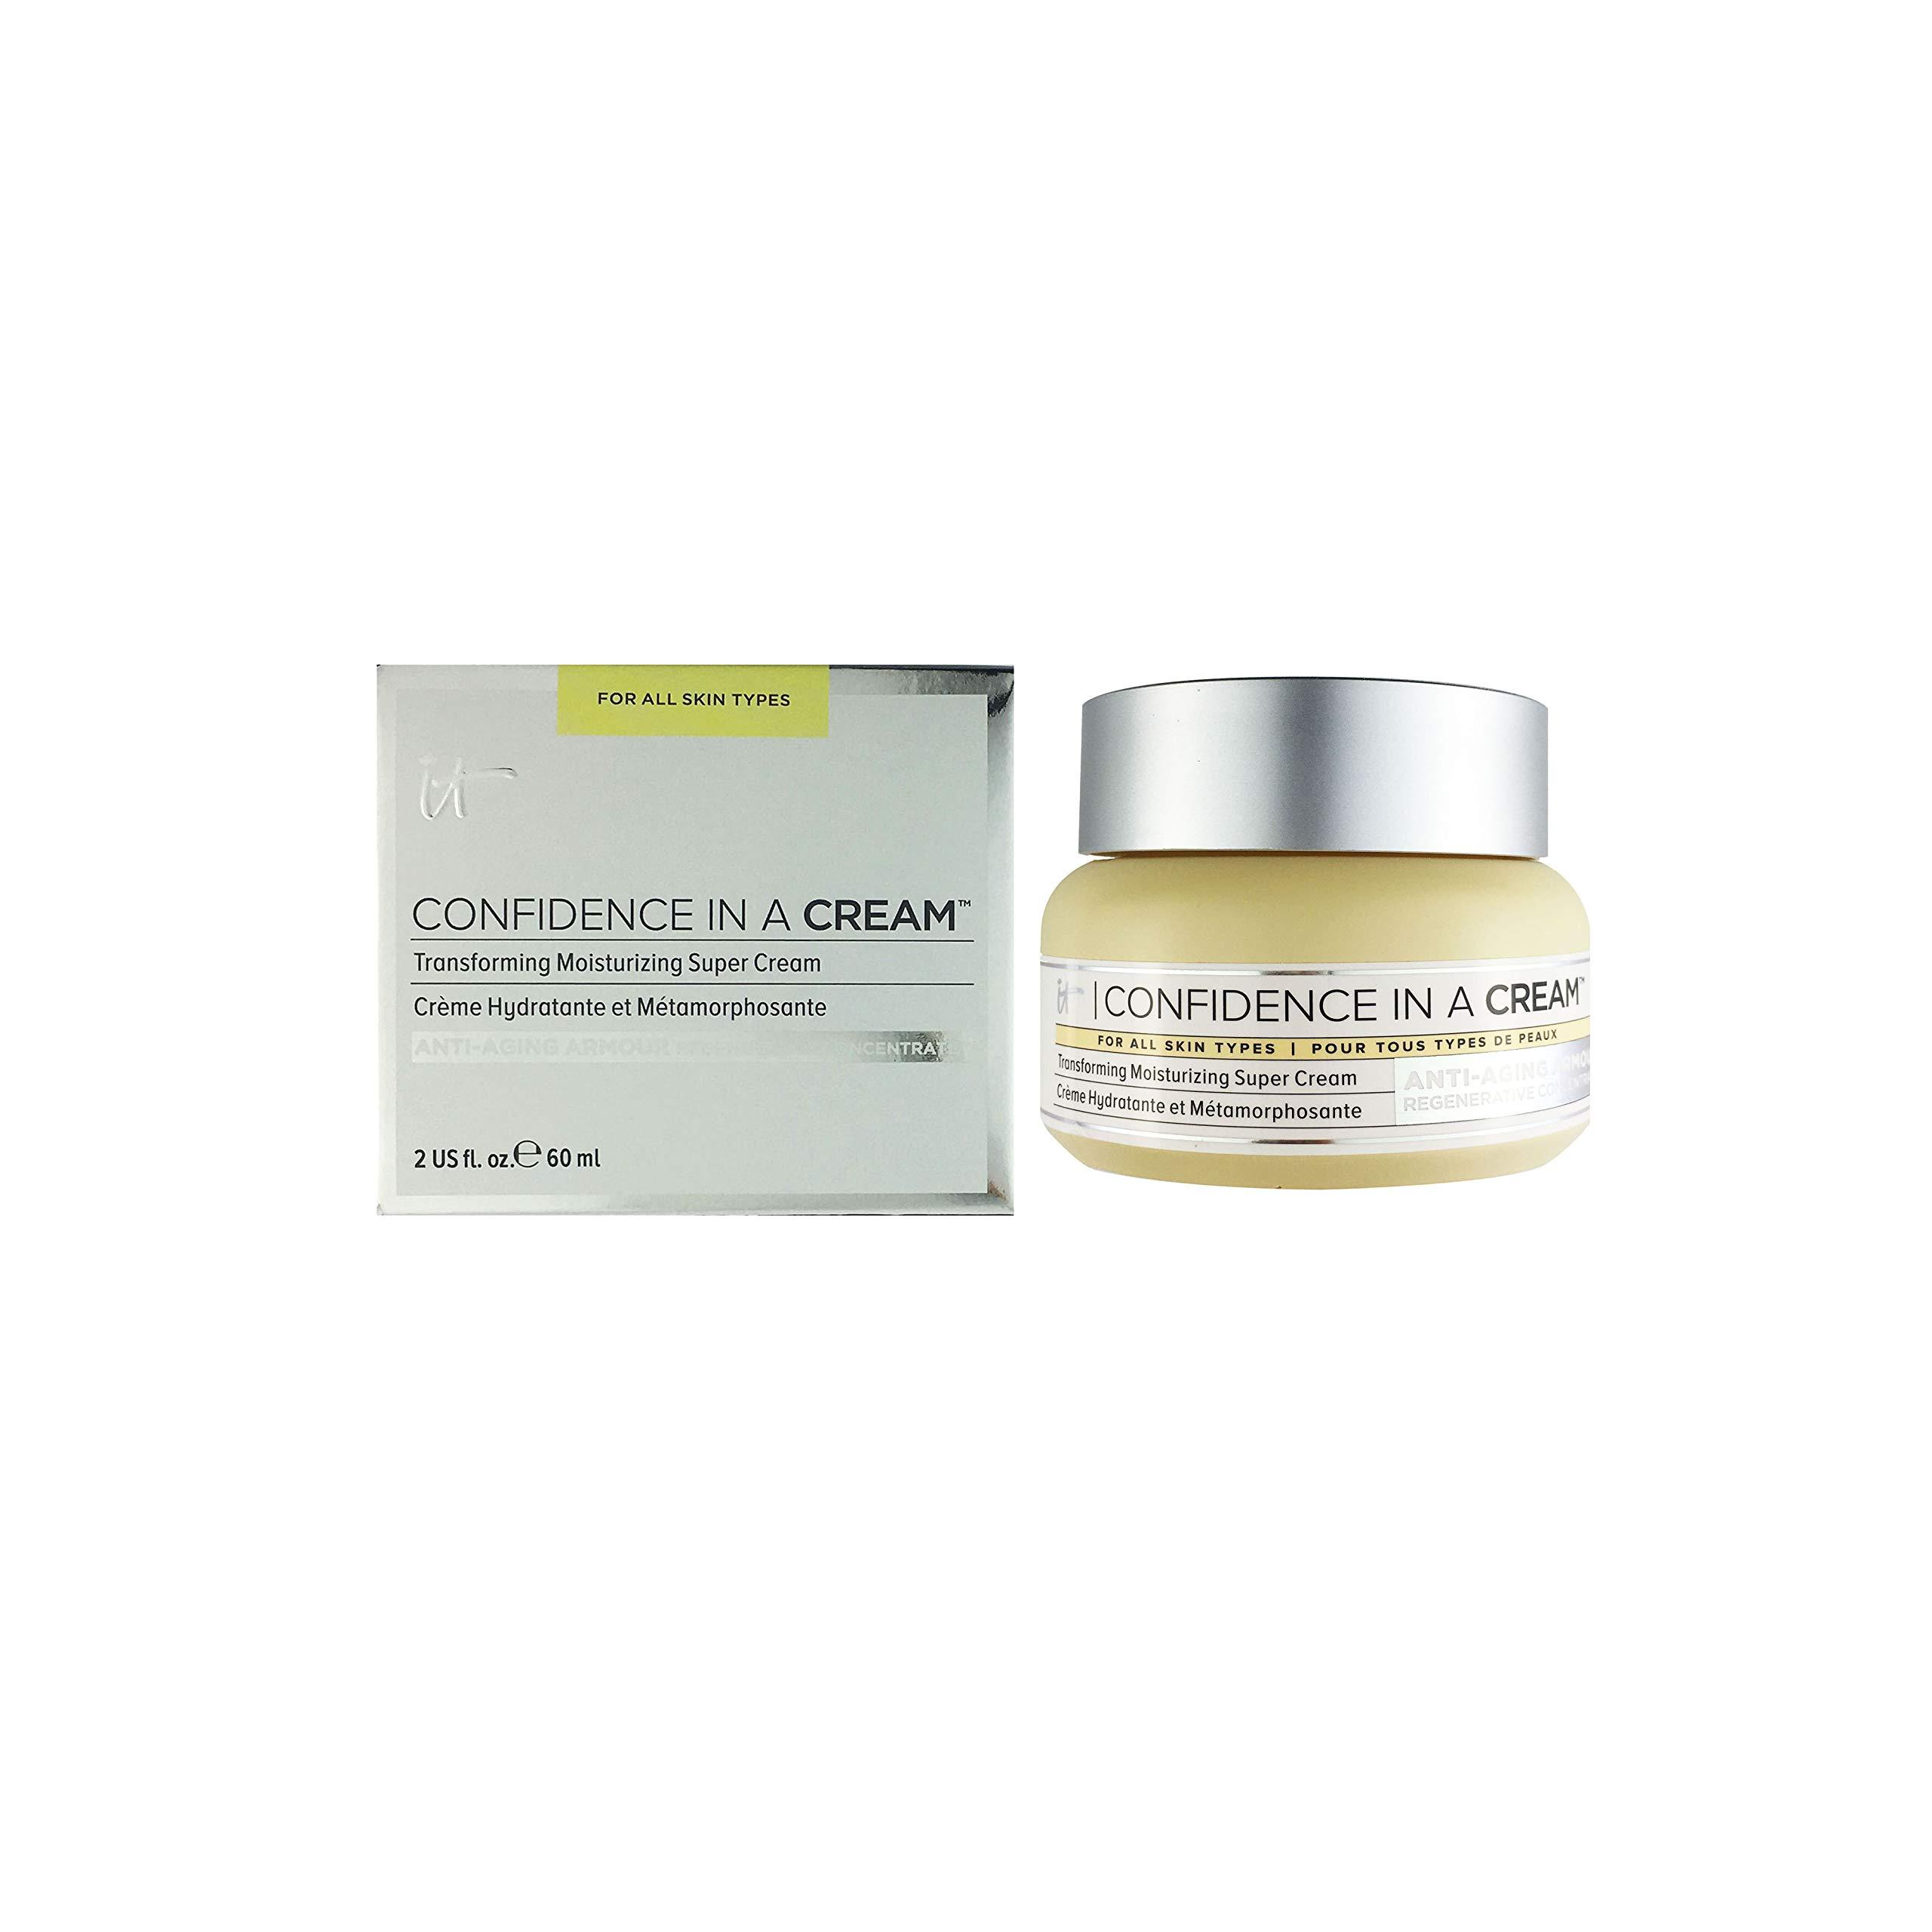 Cosmetics Confidence in a Cream Moisturizing Super Cream Moisturizer 2 oz by Beauty Cream